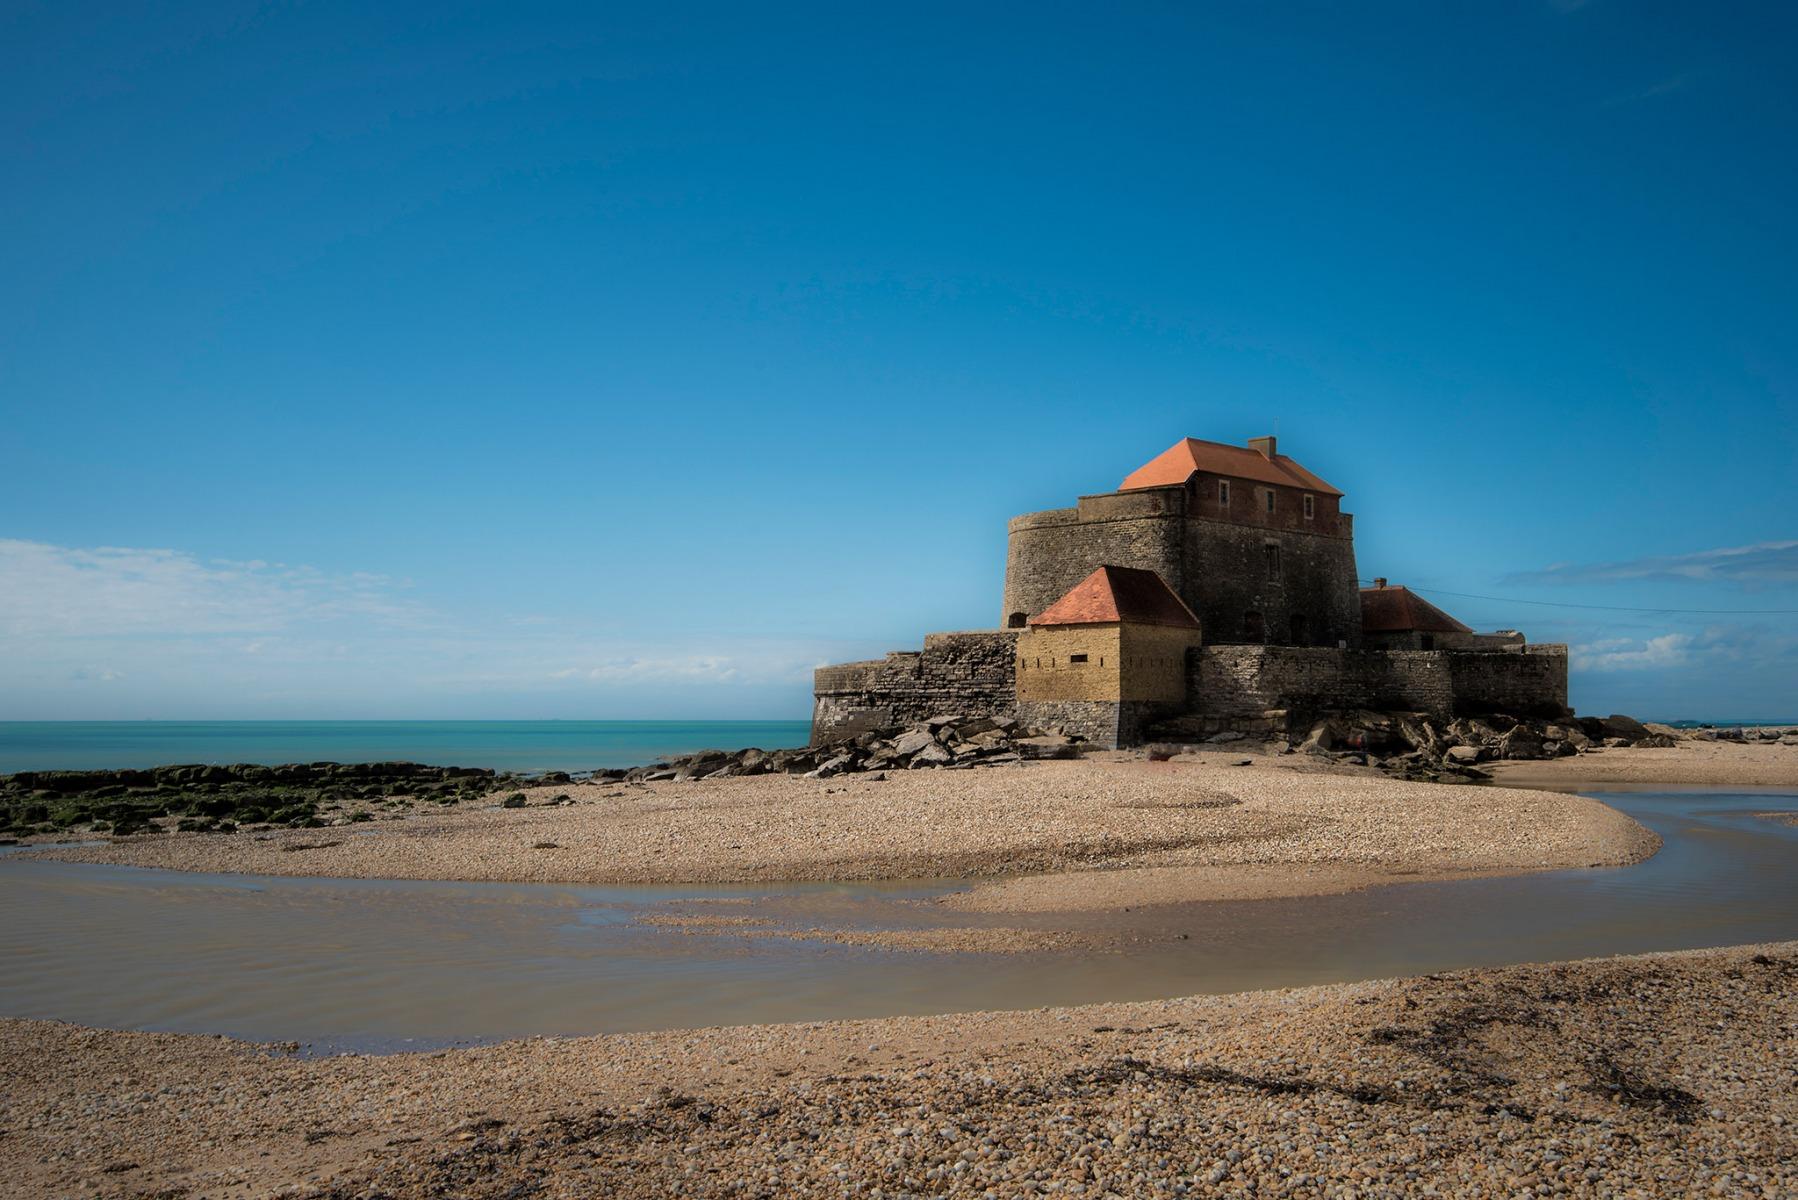 Fort-Mahon-Fort-dAmbleteuse